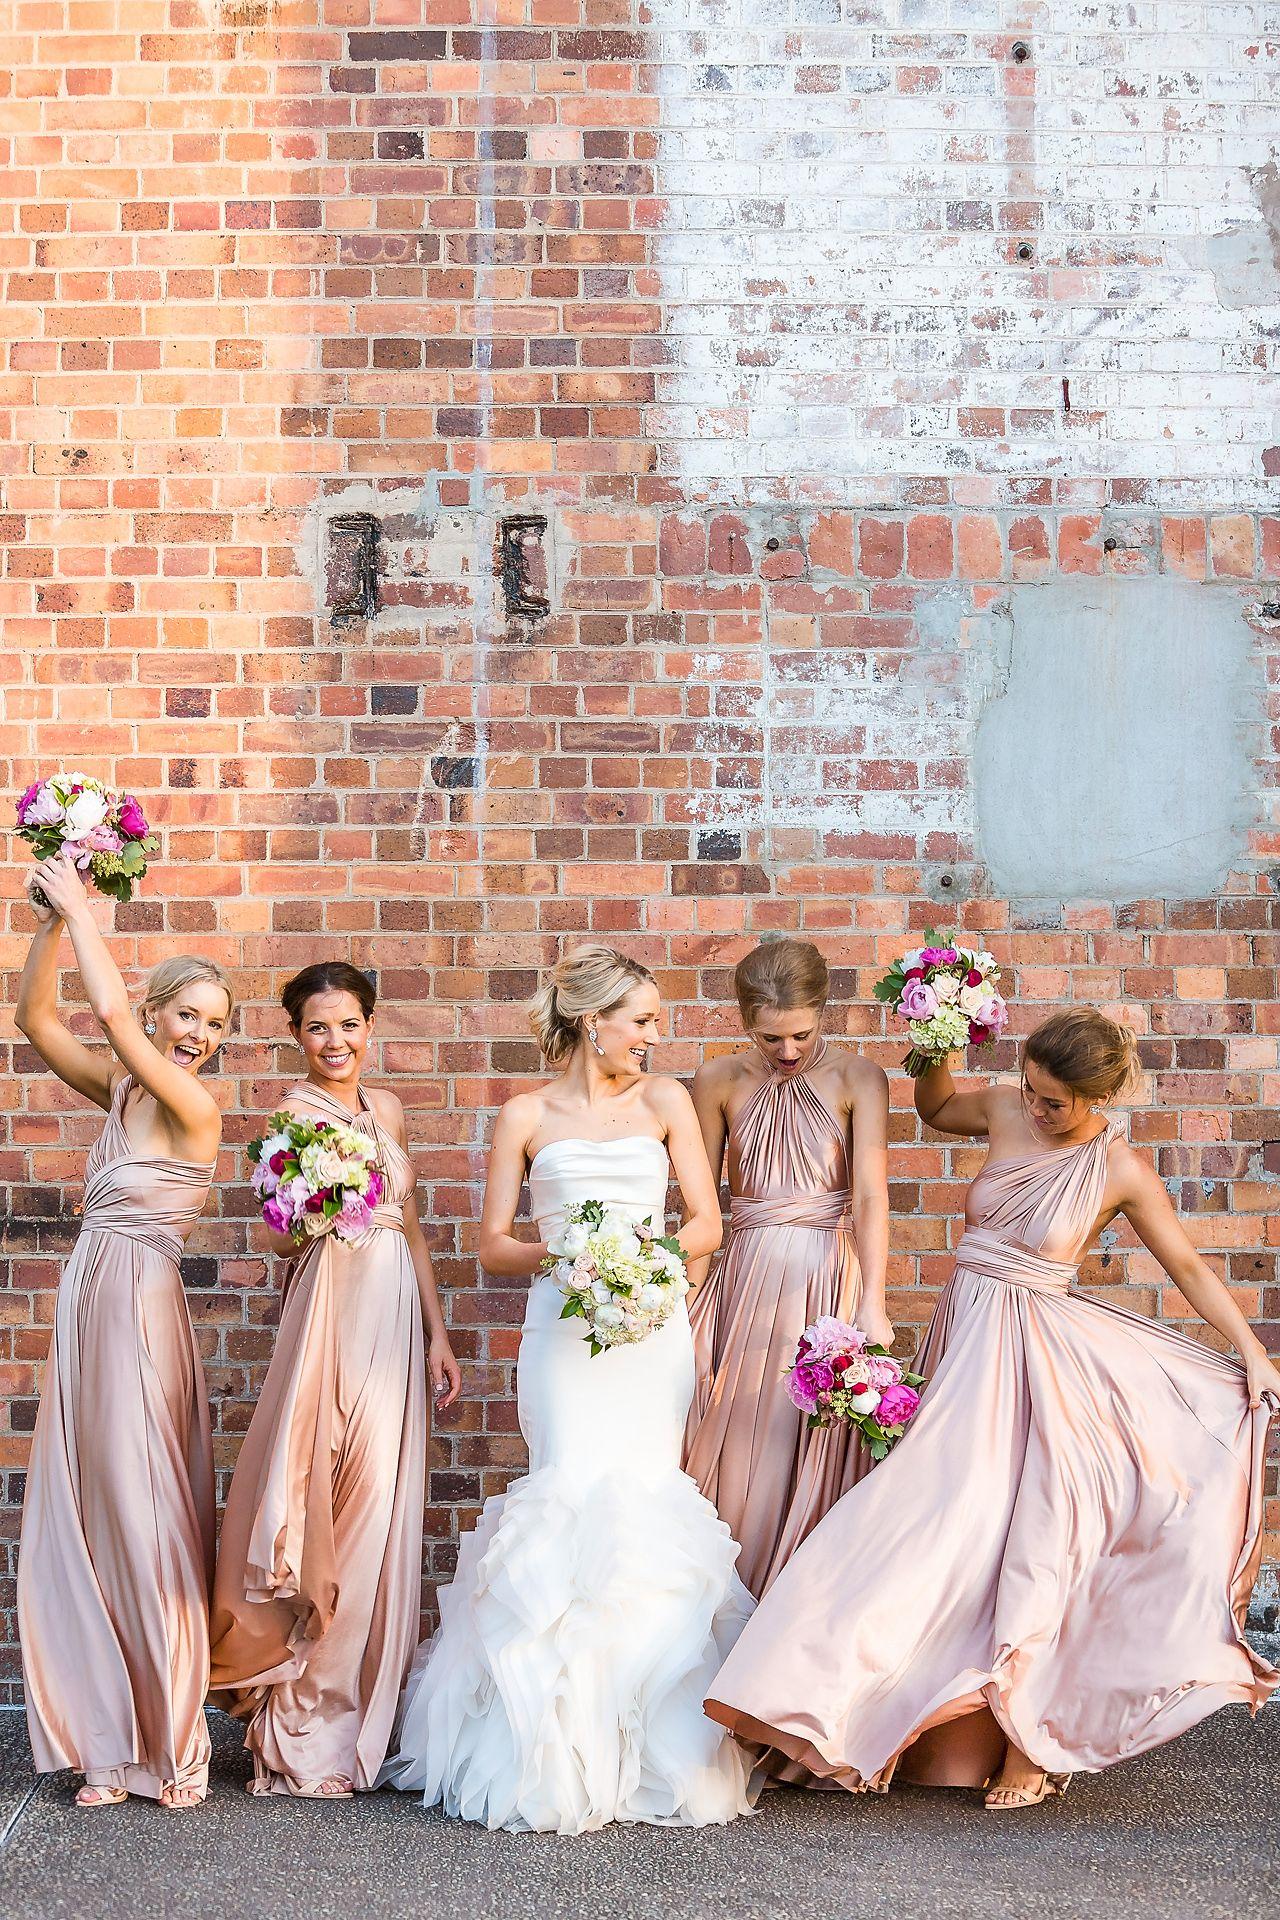 nice blush bridesmaid dresses and awesome bride in Vera Wang wedding ...